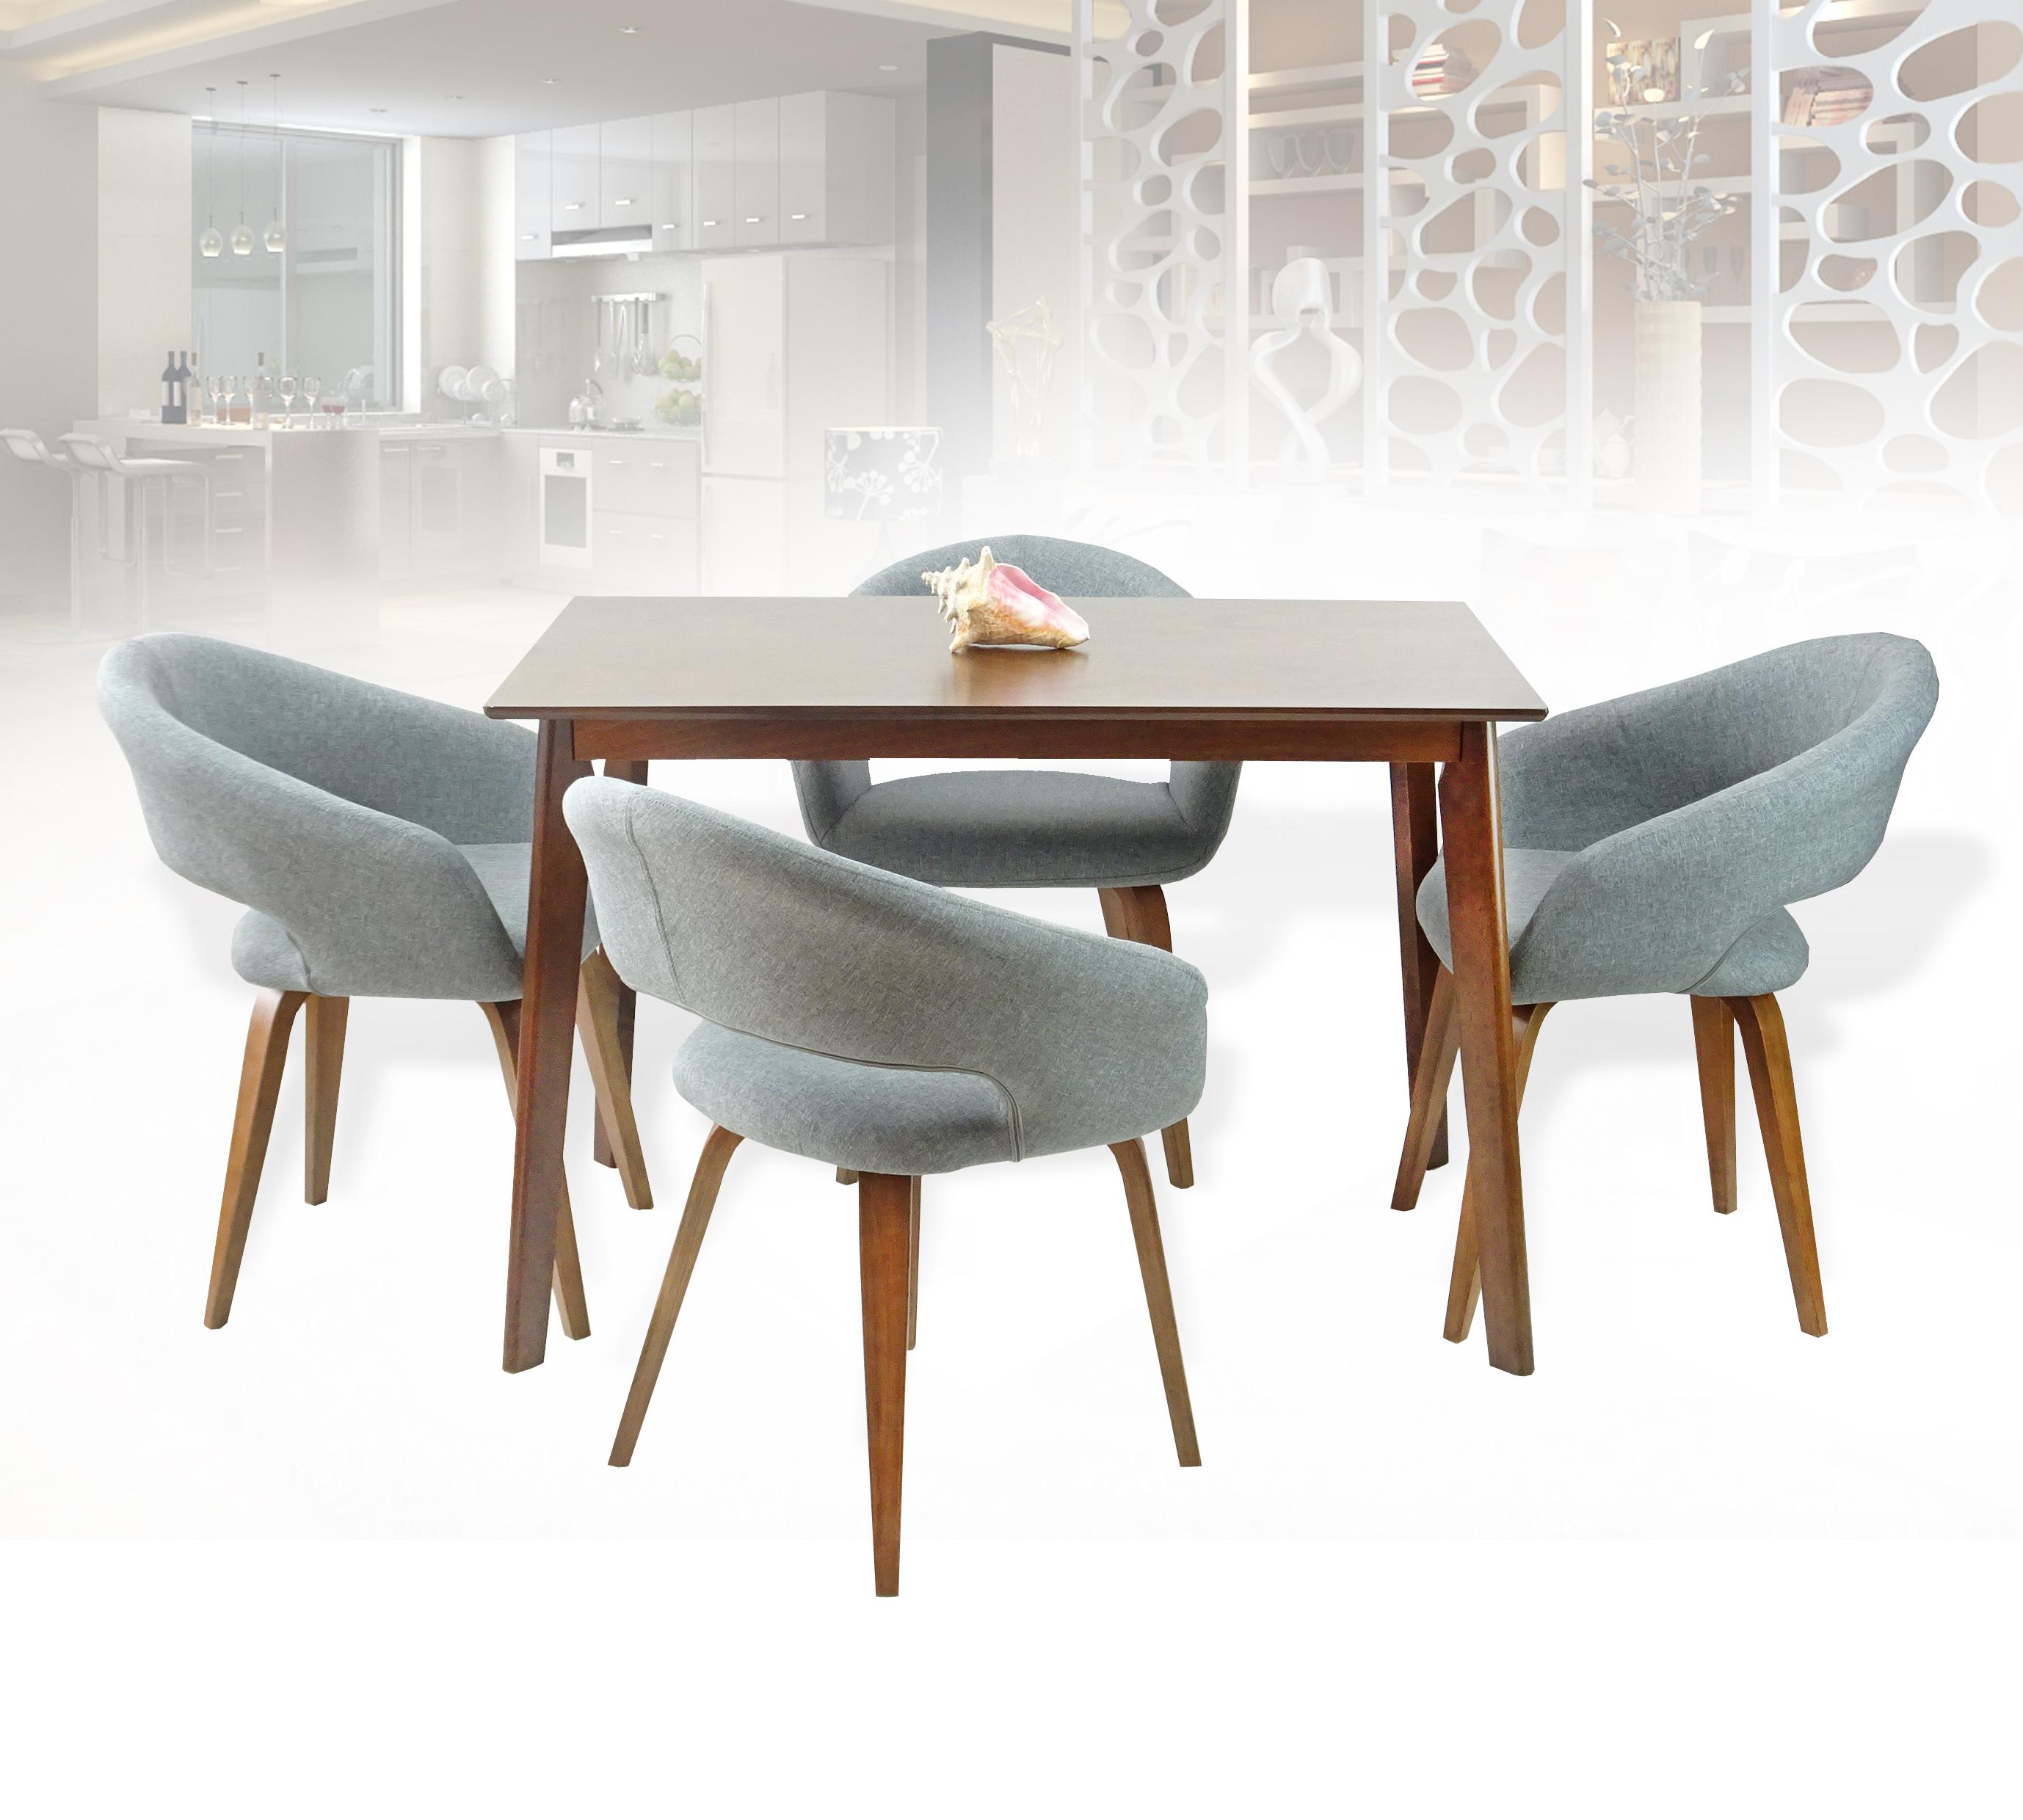 Buy Dining Kitchen Set Of 5 Rectangular Wooden Brown Table